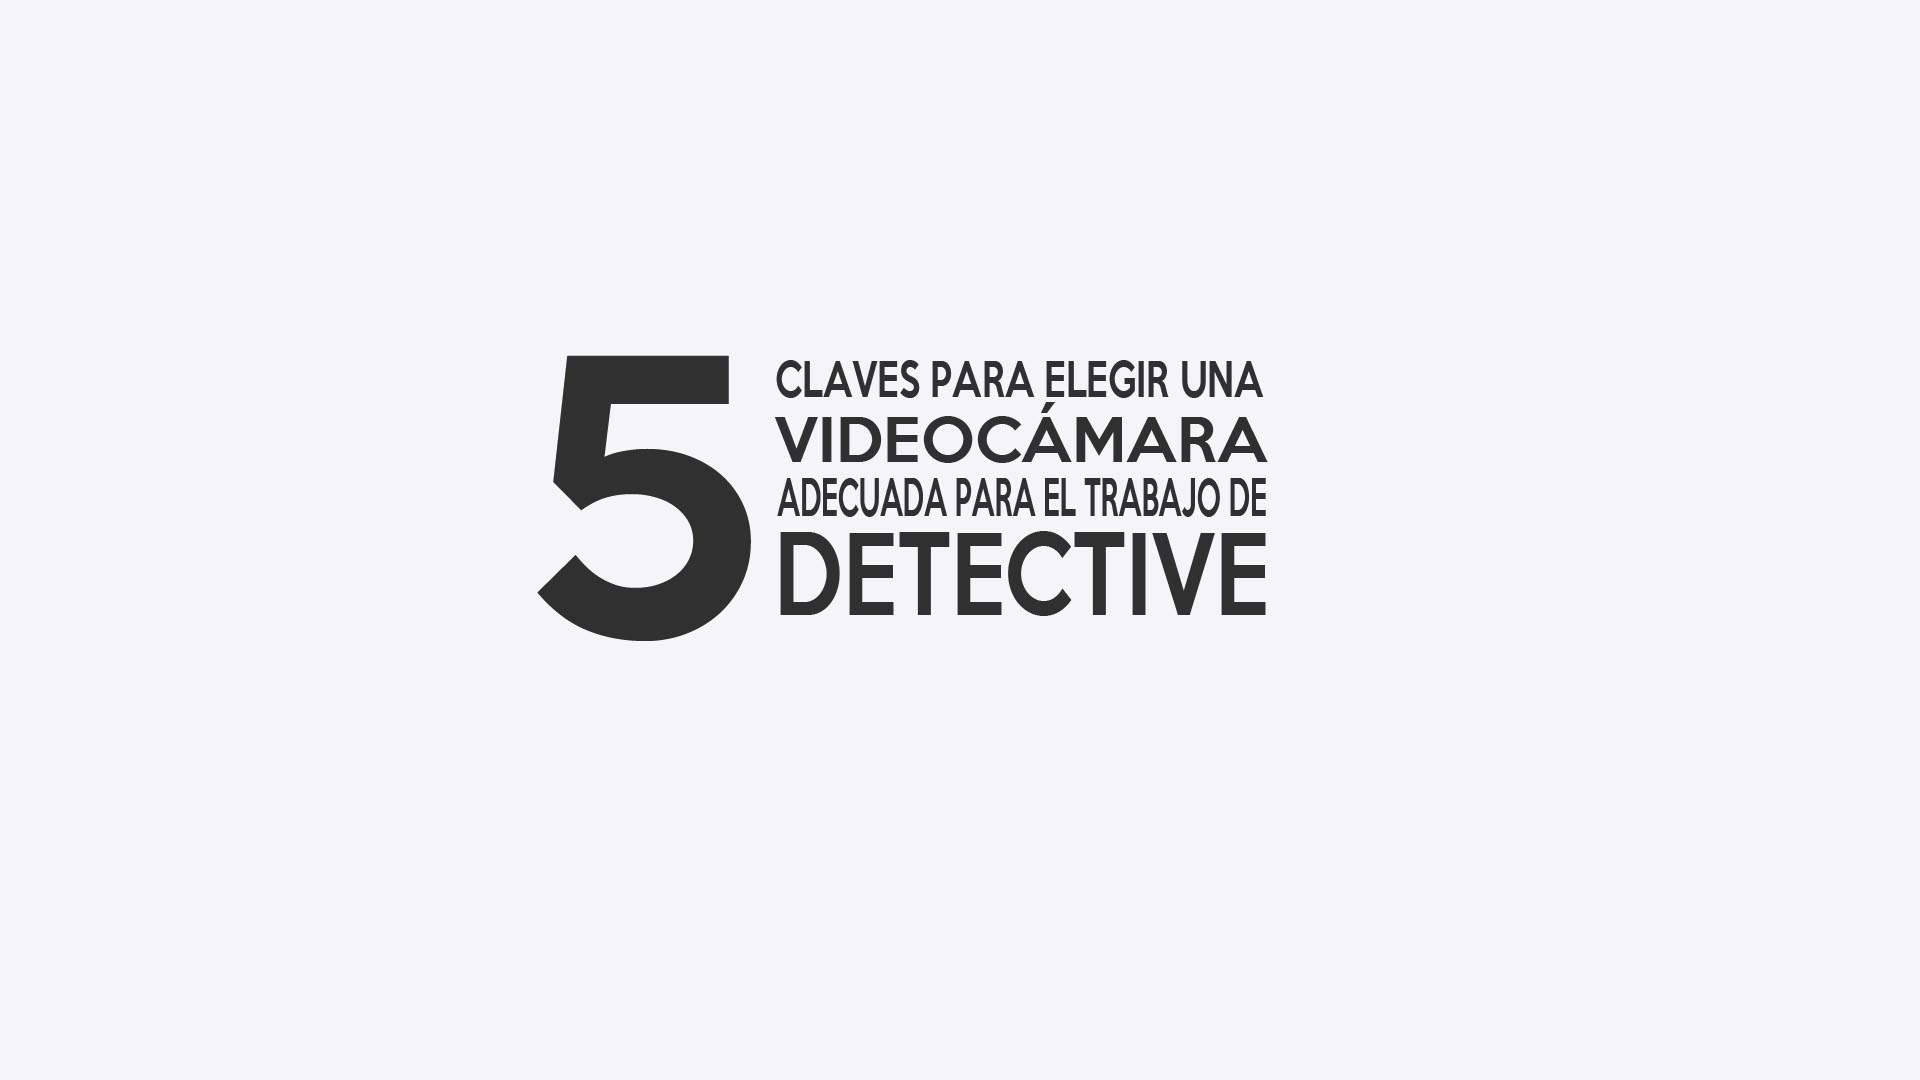 Videocámaras para detectives